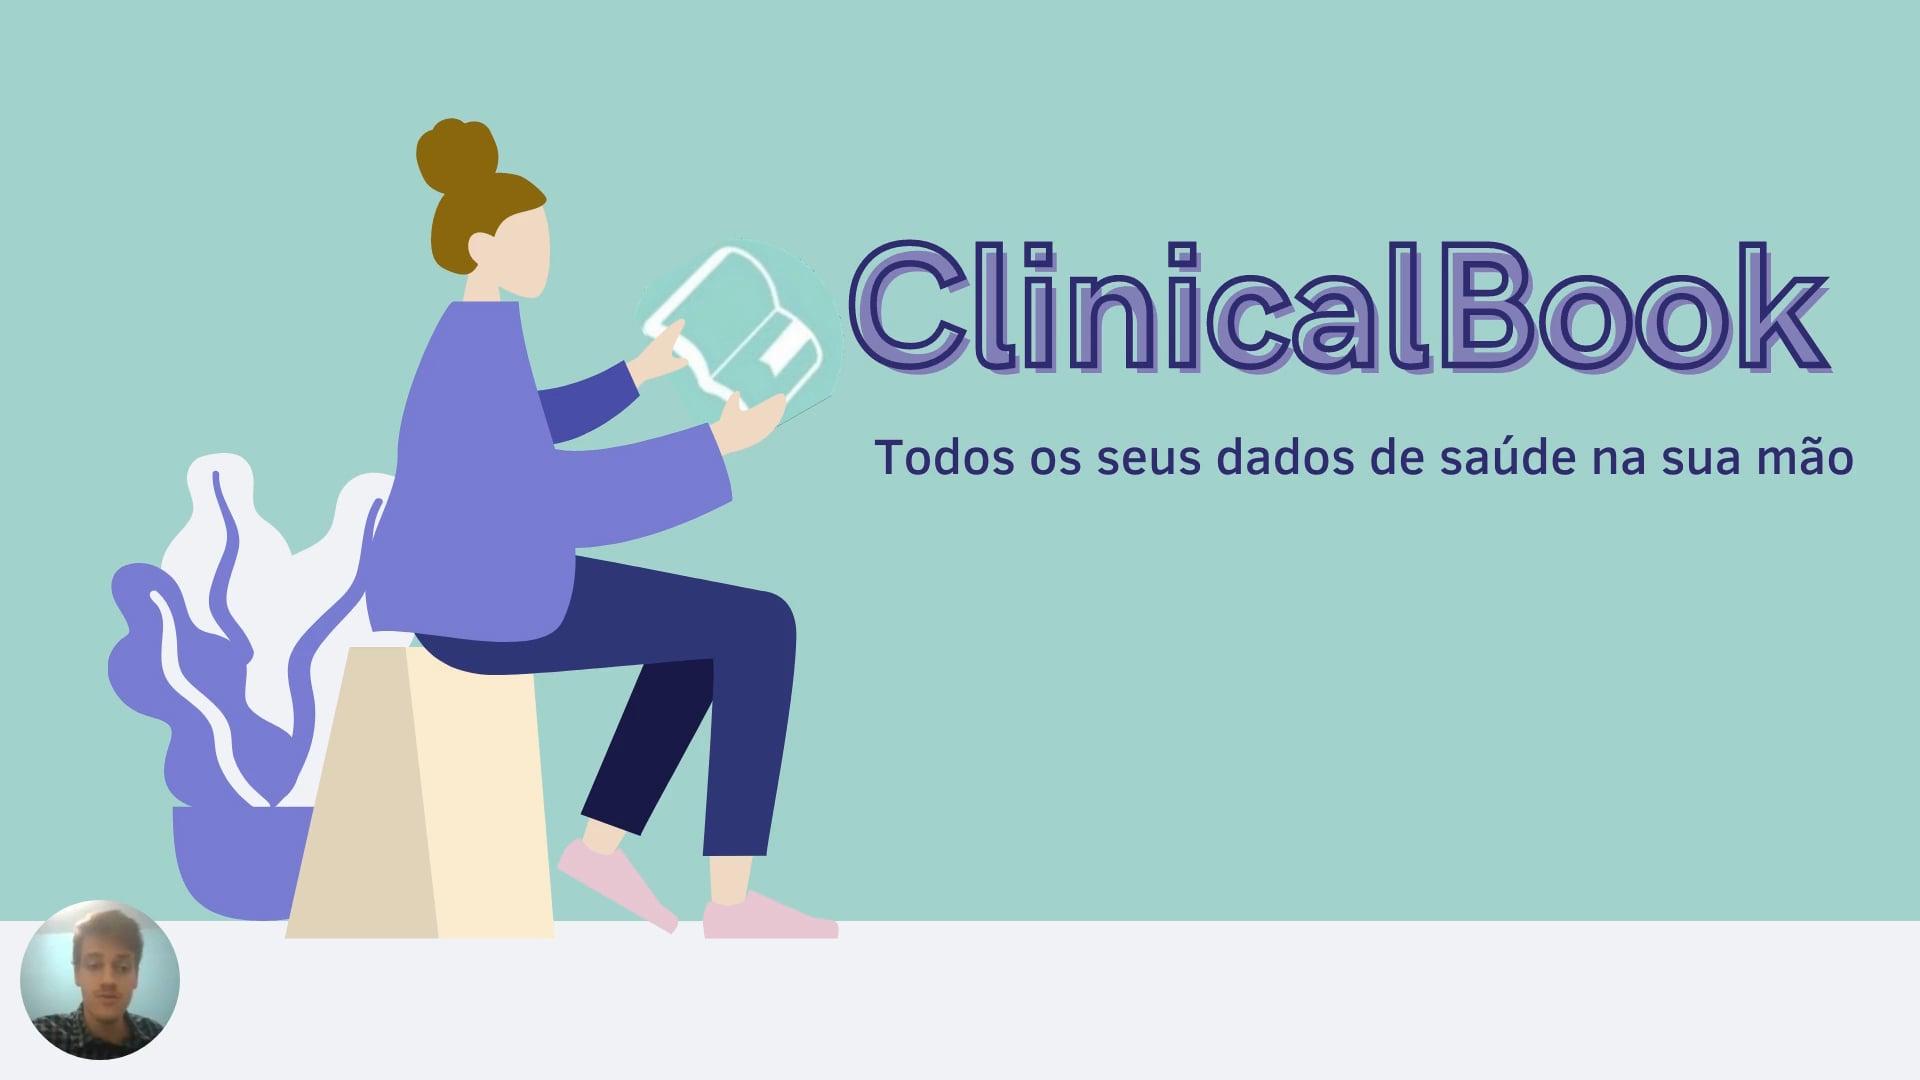 ClinicalBook